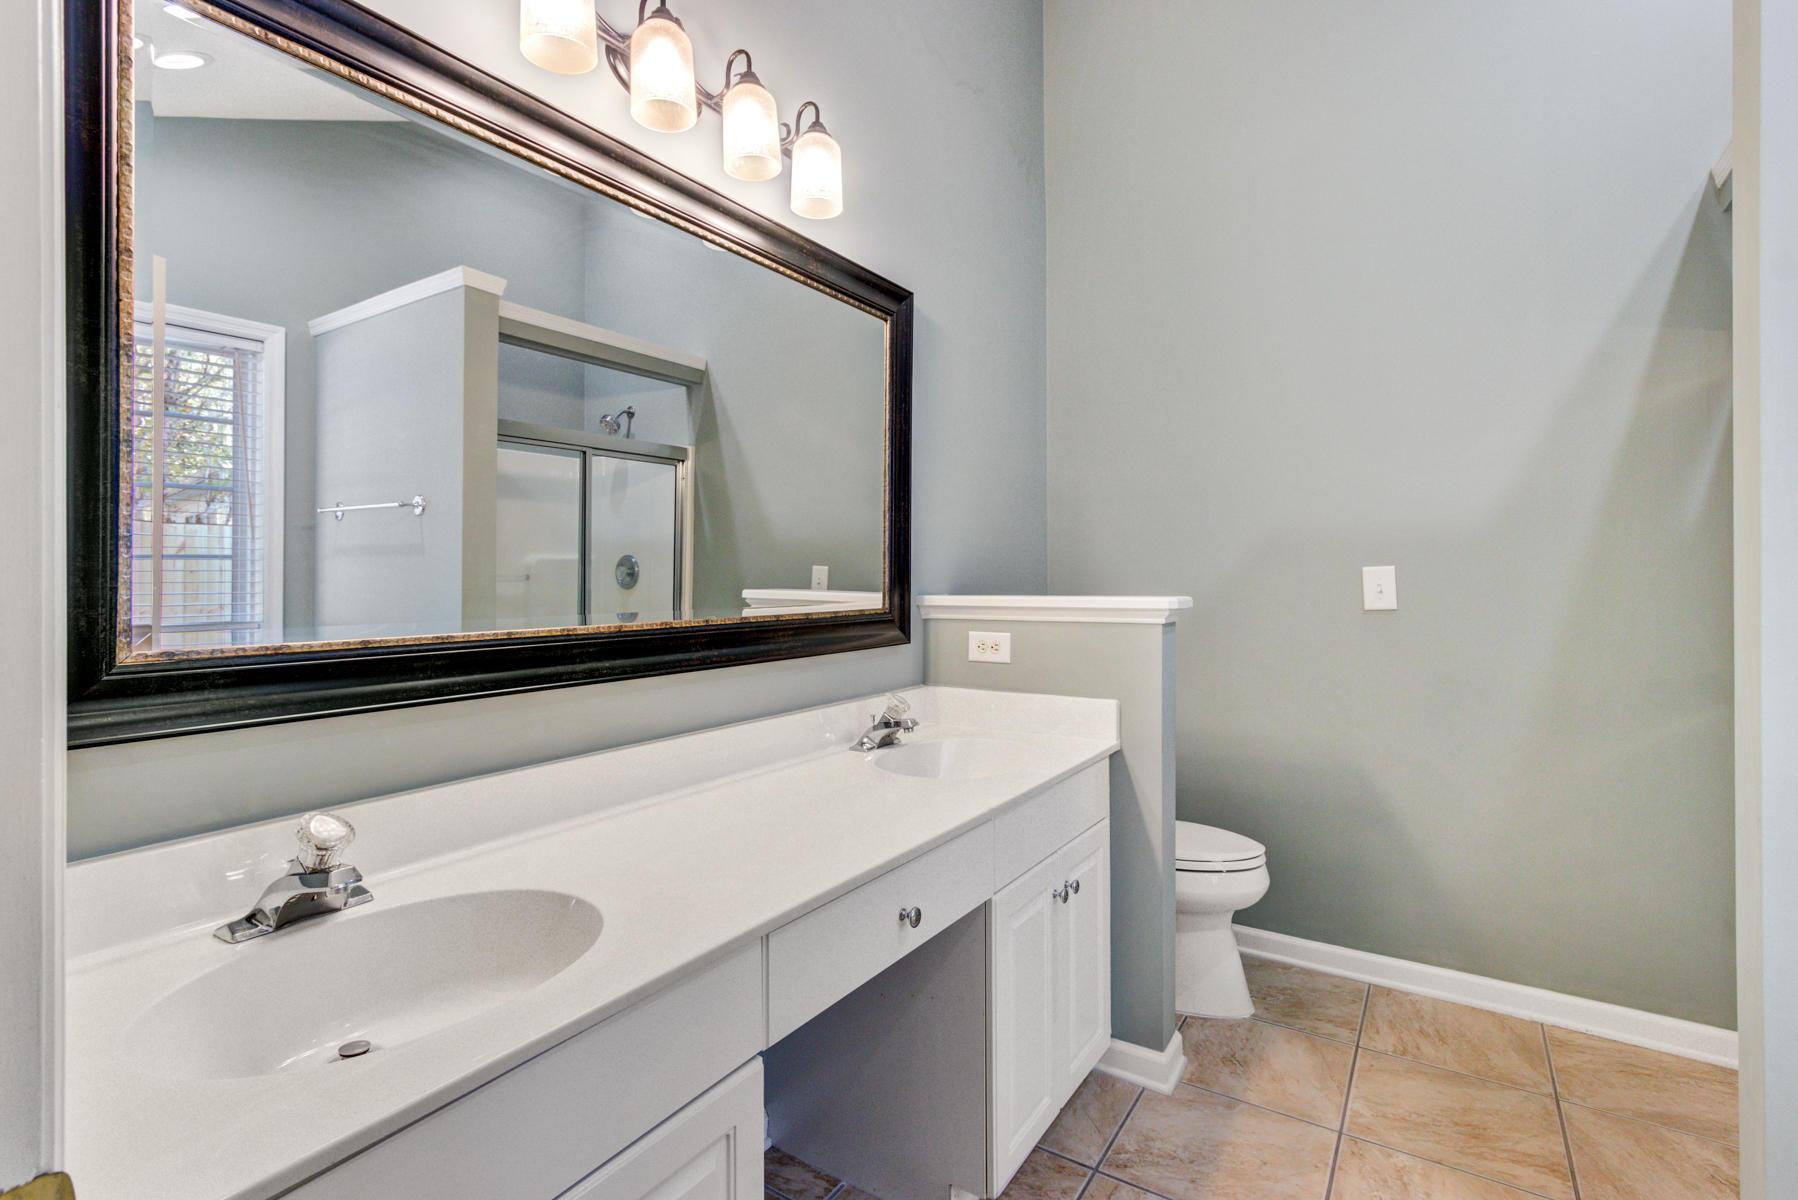 Park West Homes For Sale - 3444 Wellesley, Mount Pleasant, SC - 9